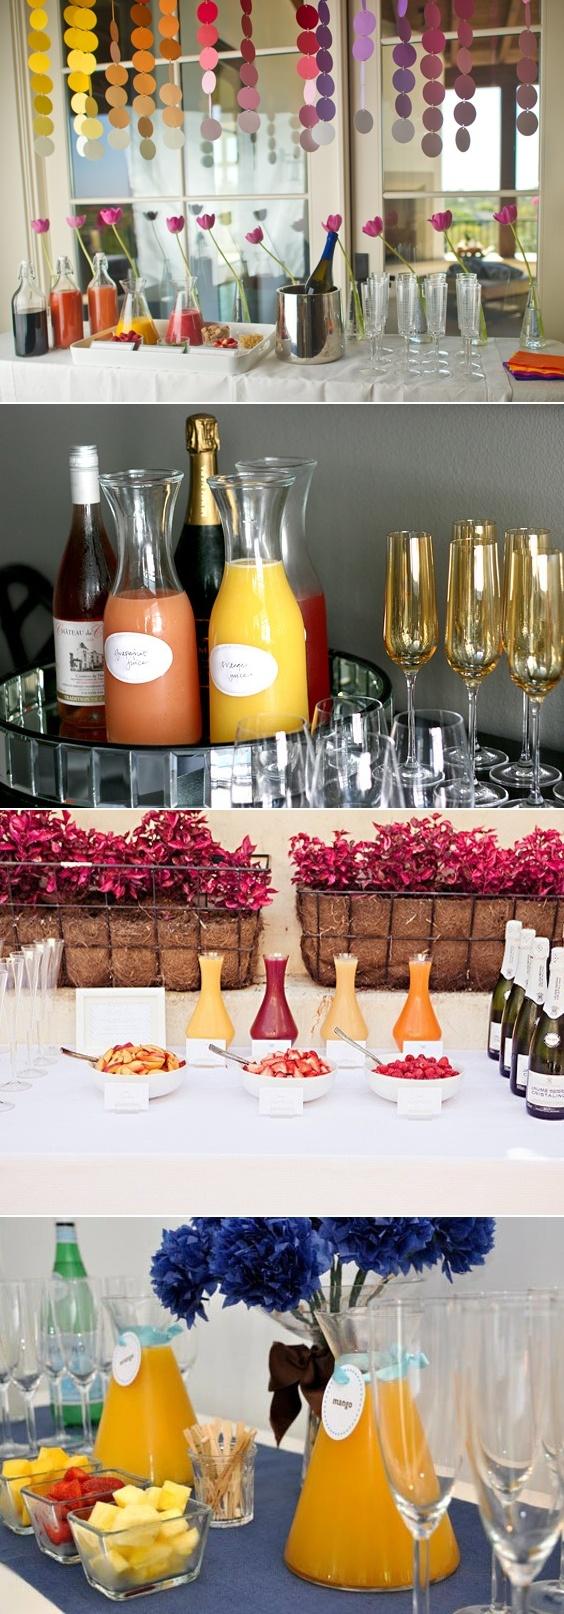 mimosa bar: beautiful setup